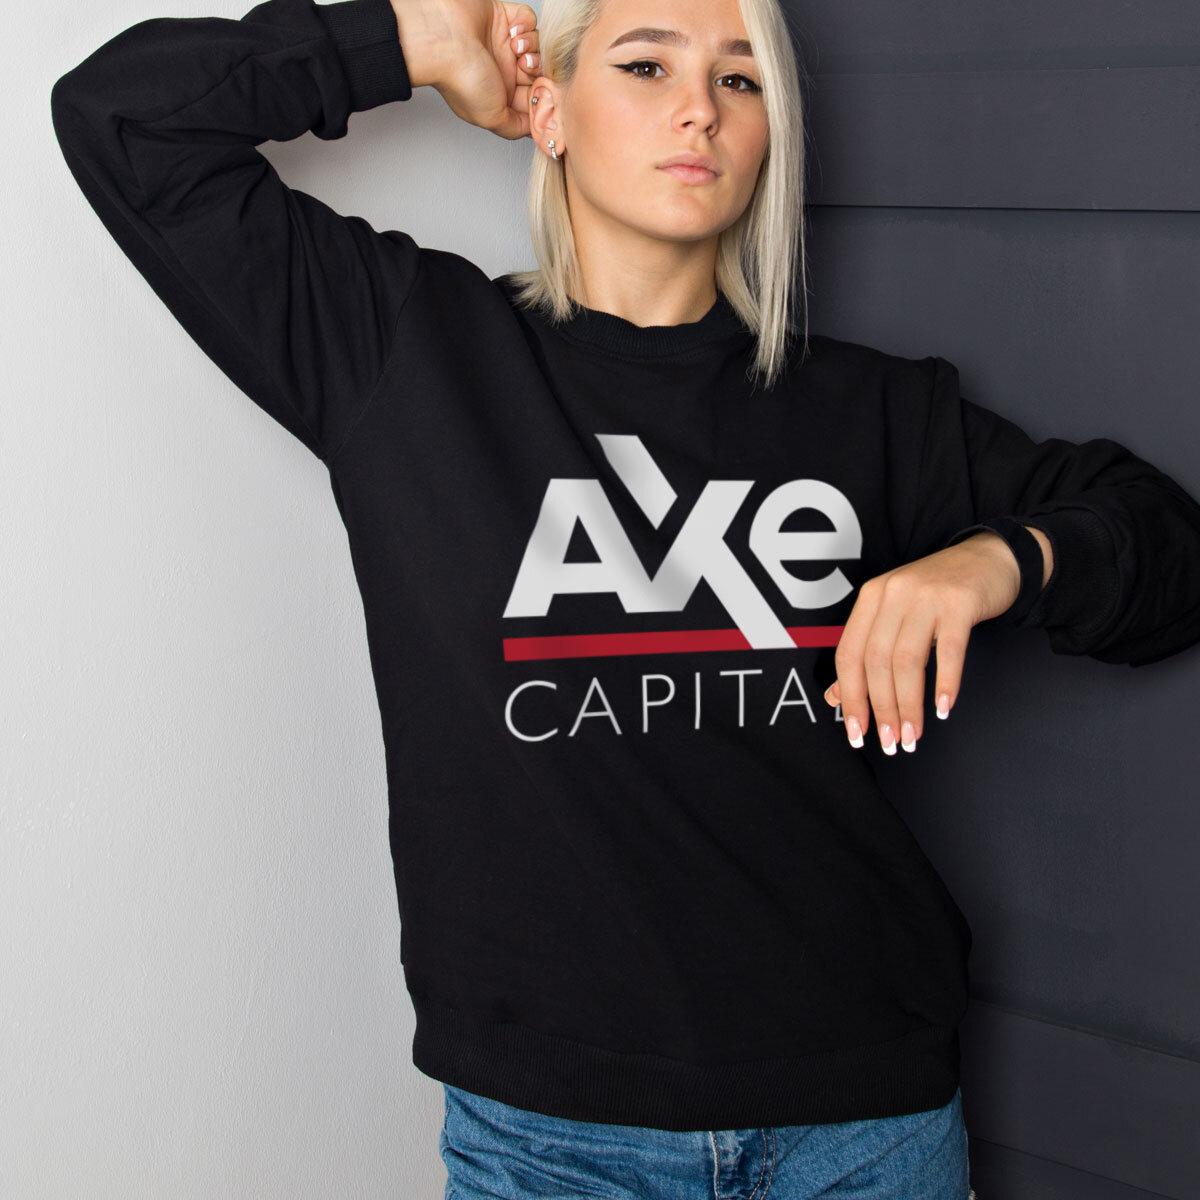 https://www.shirtstore.no/pub_docs/files/Kläder/GirlsSweat_Big.jpg